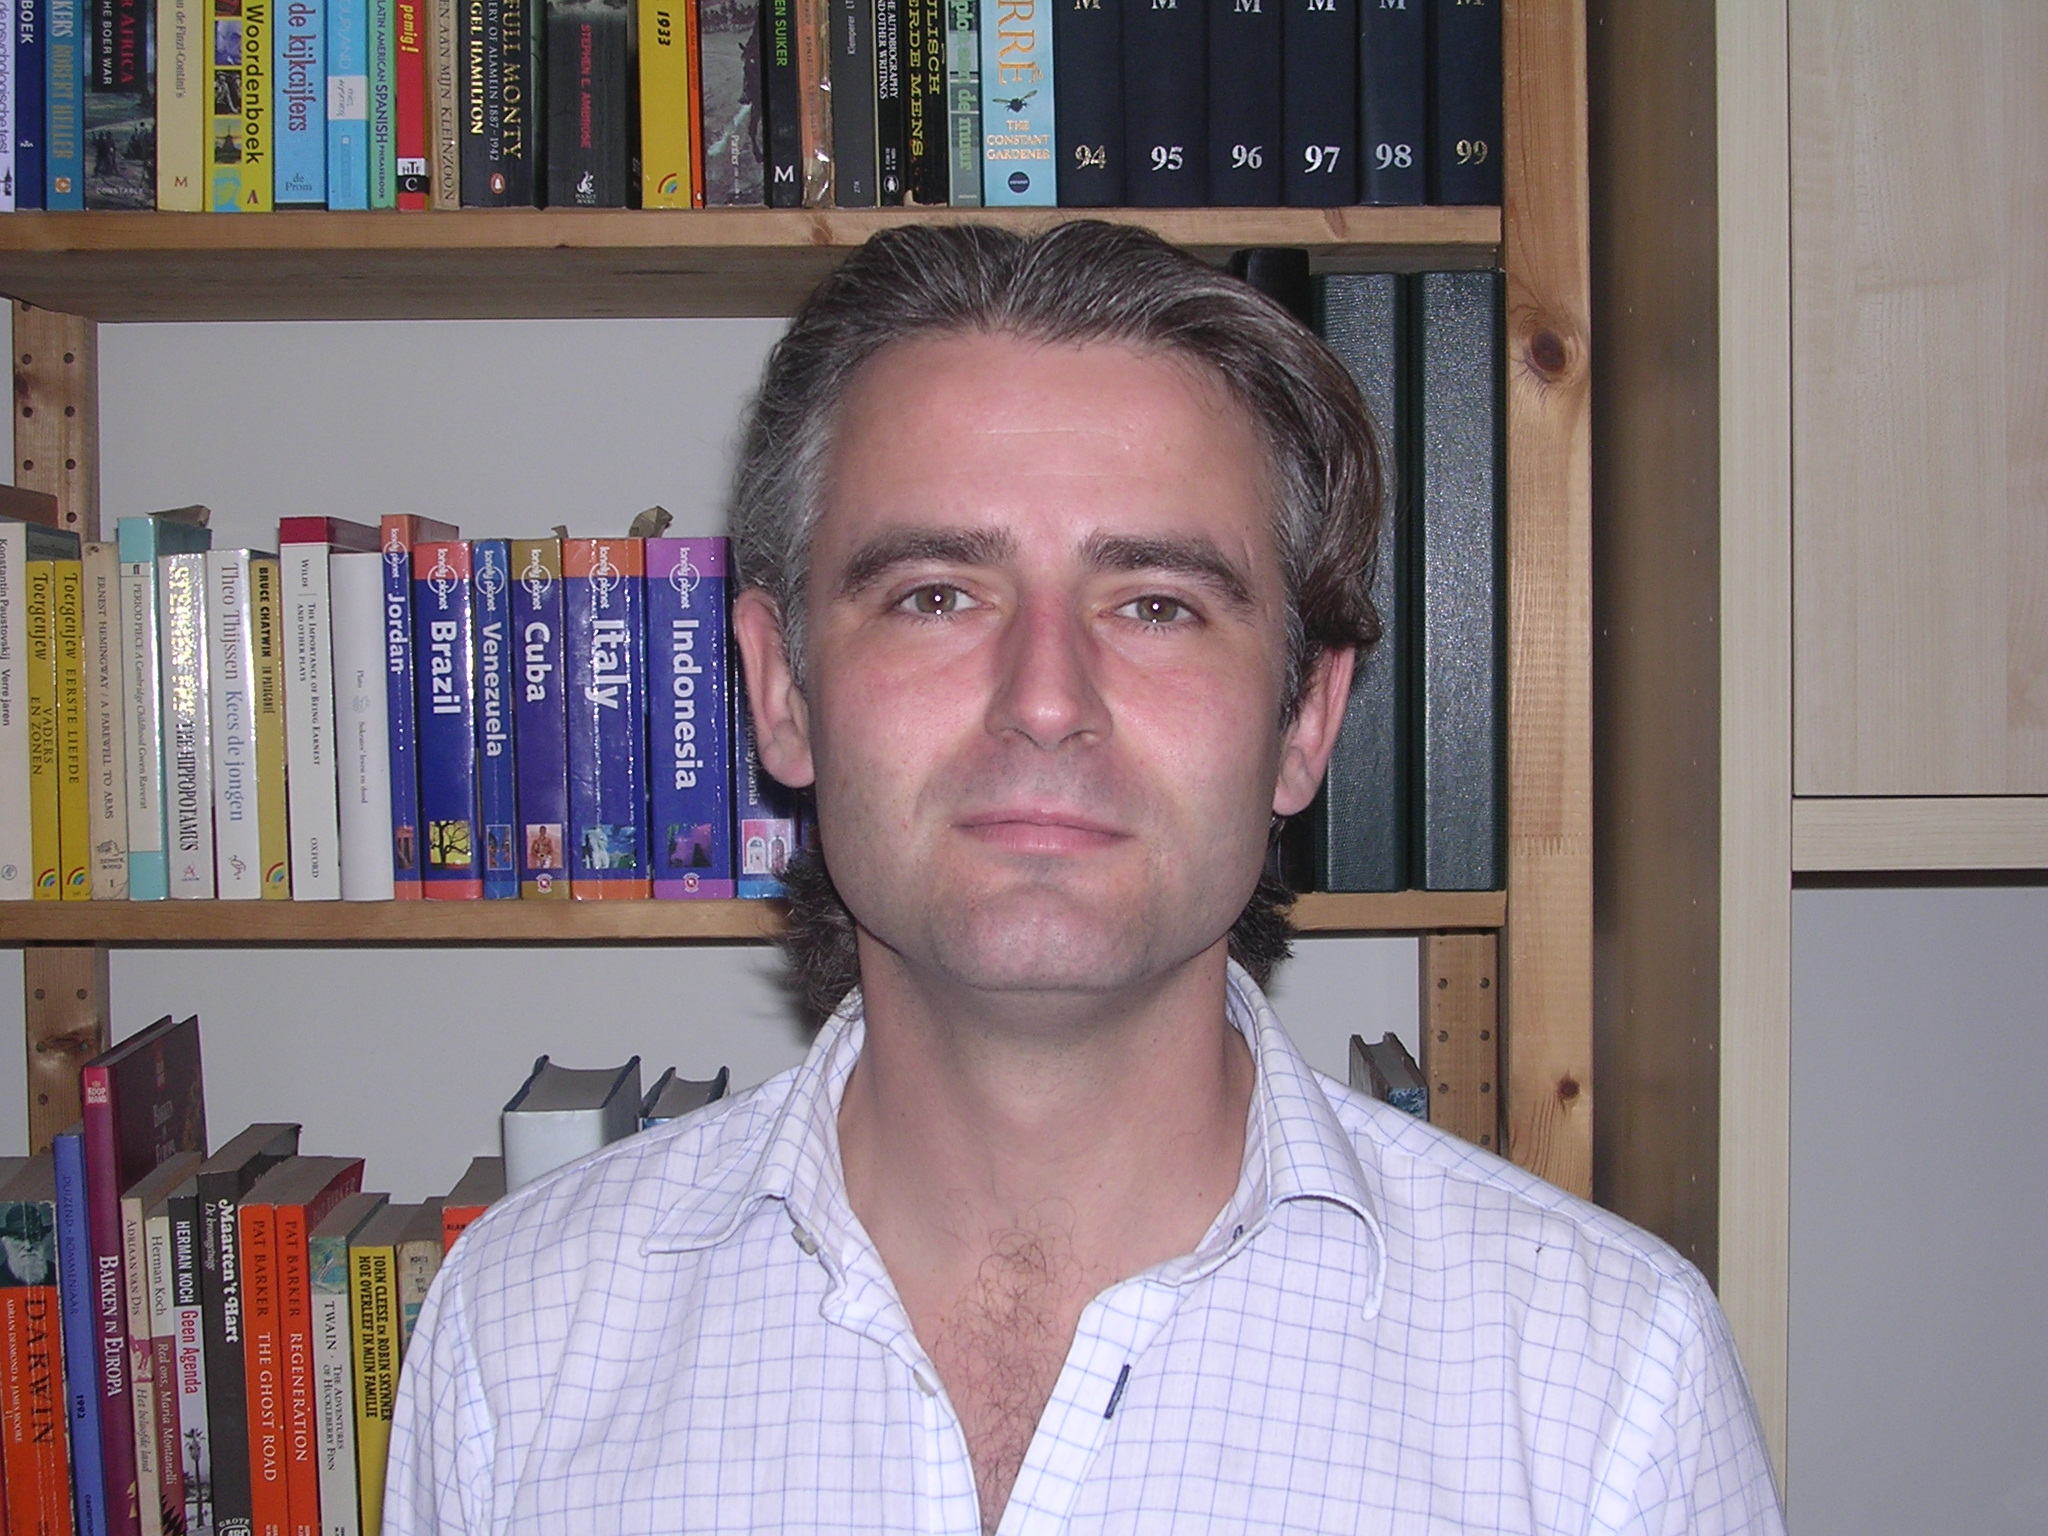 Mark Maathuis